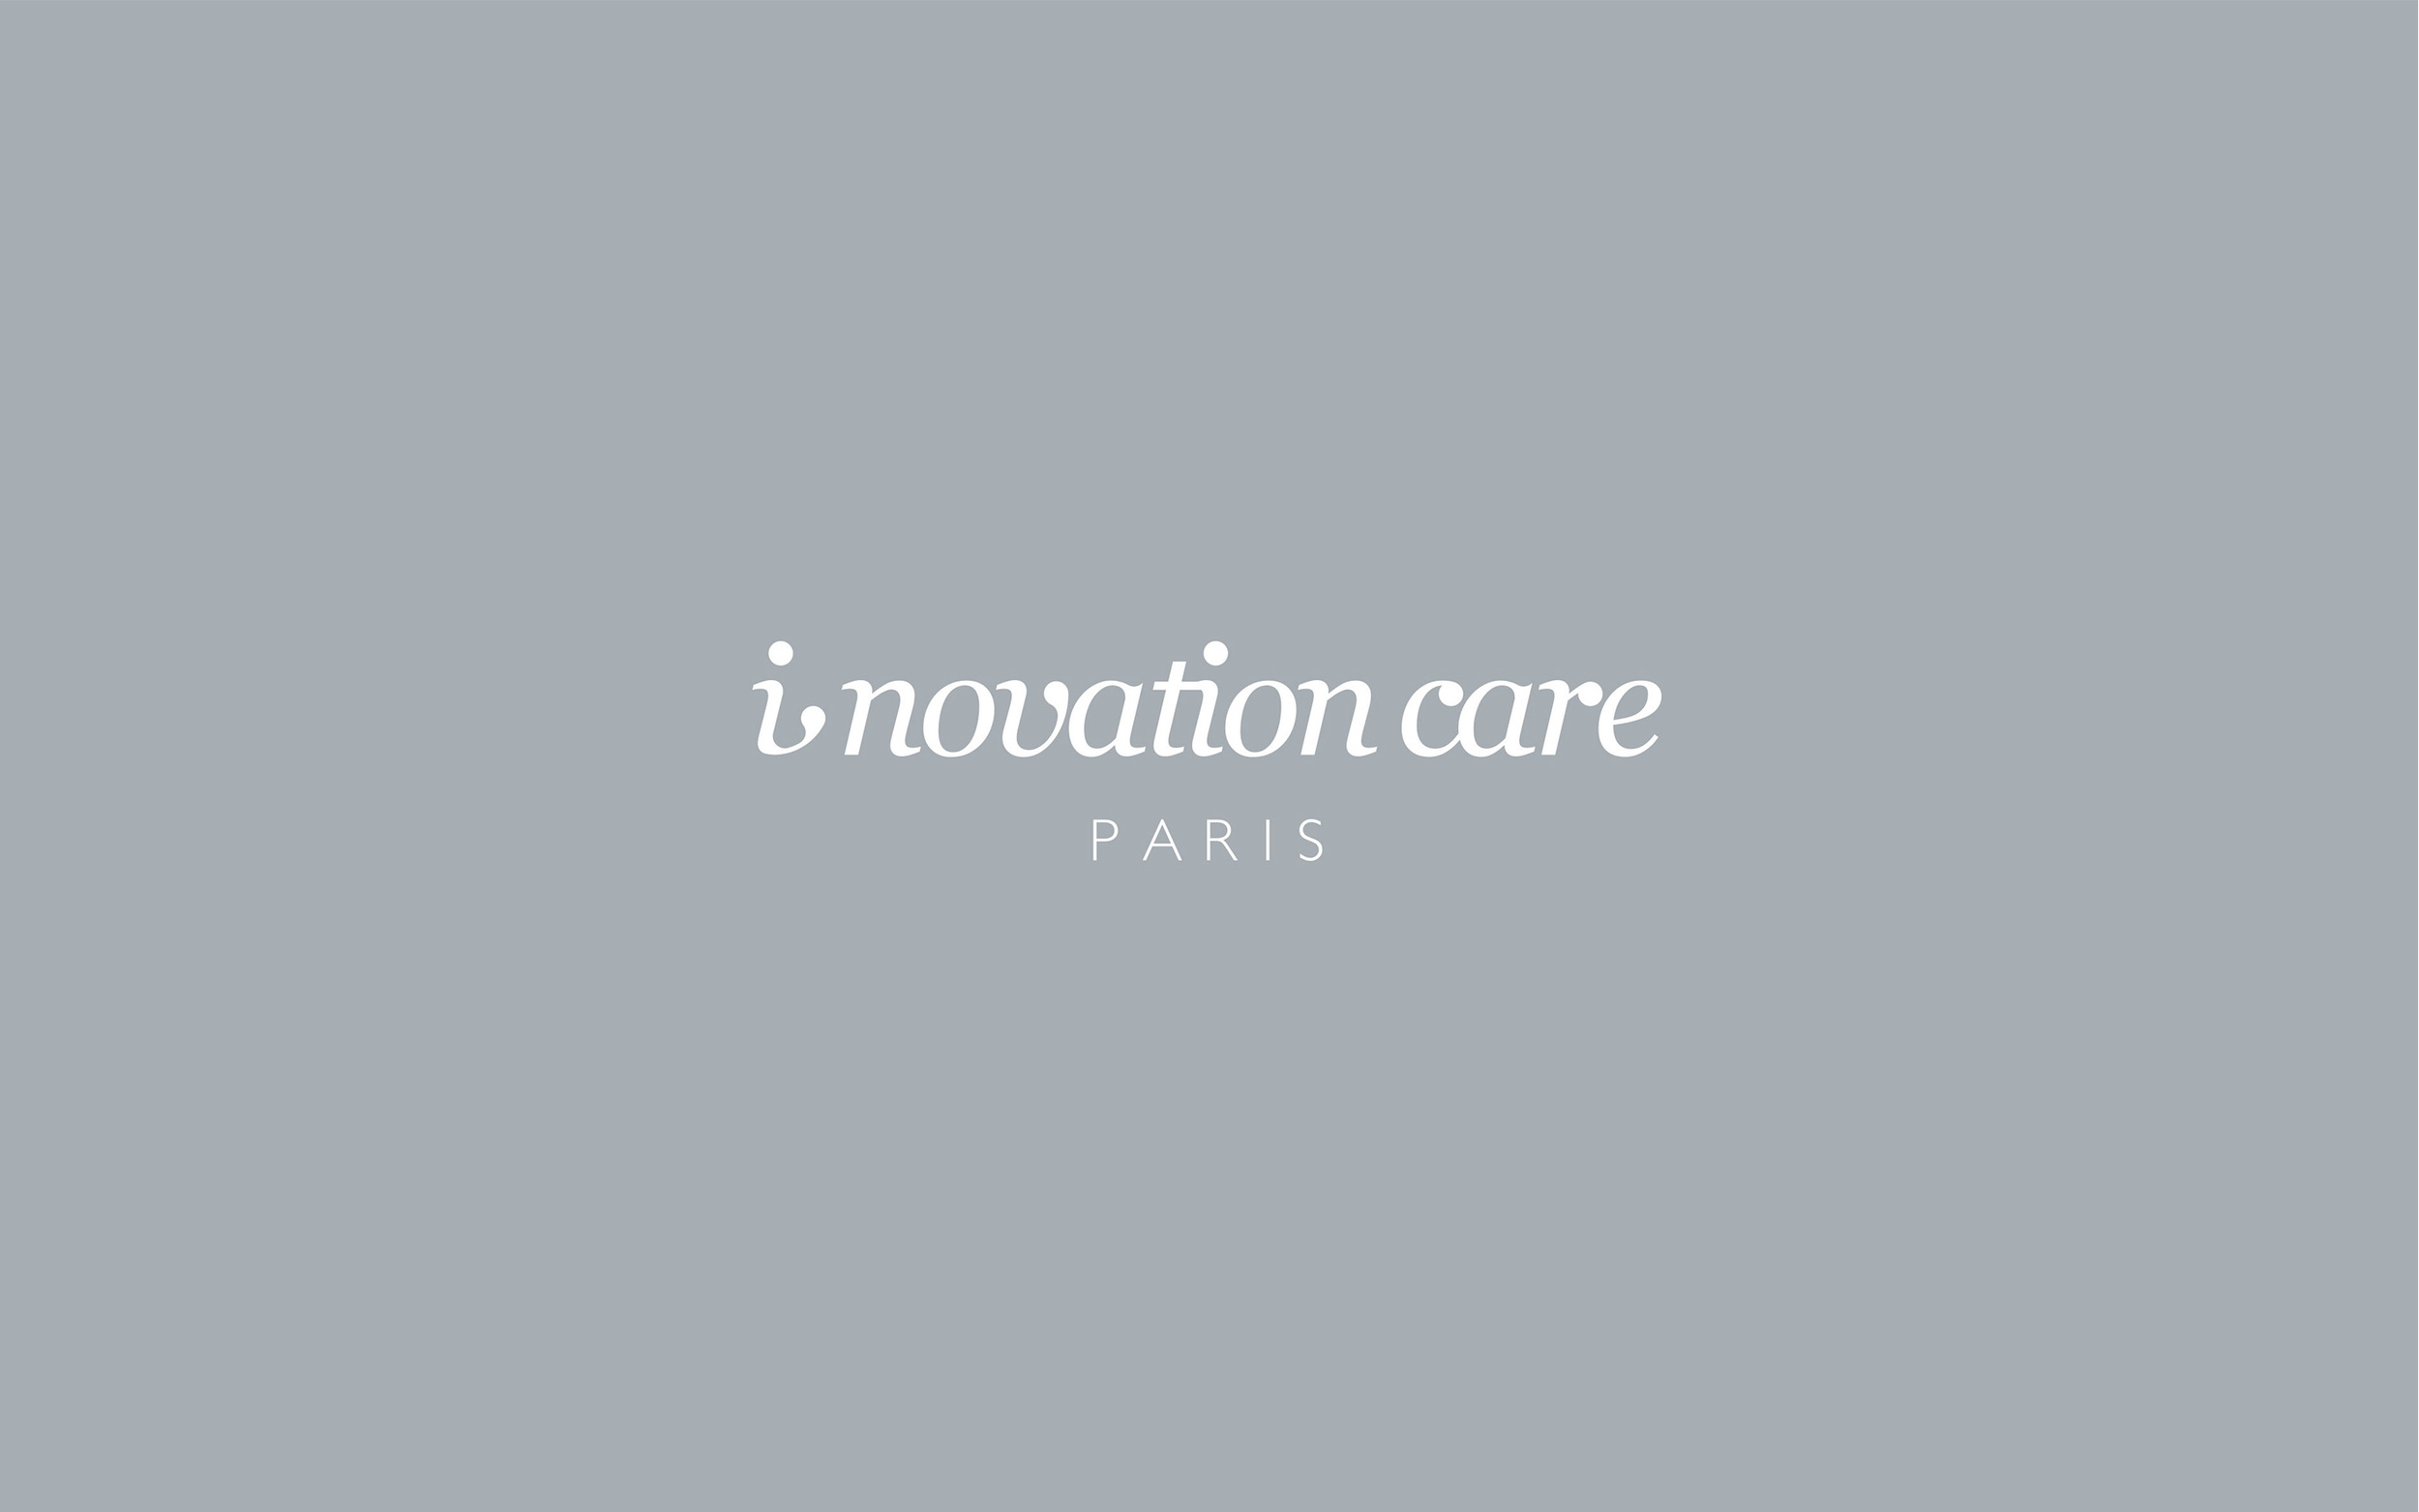 inovationcare-design-childer-02.jpg